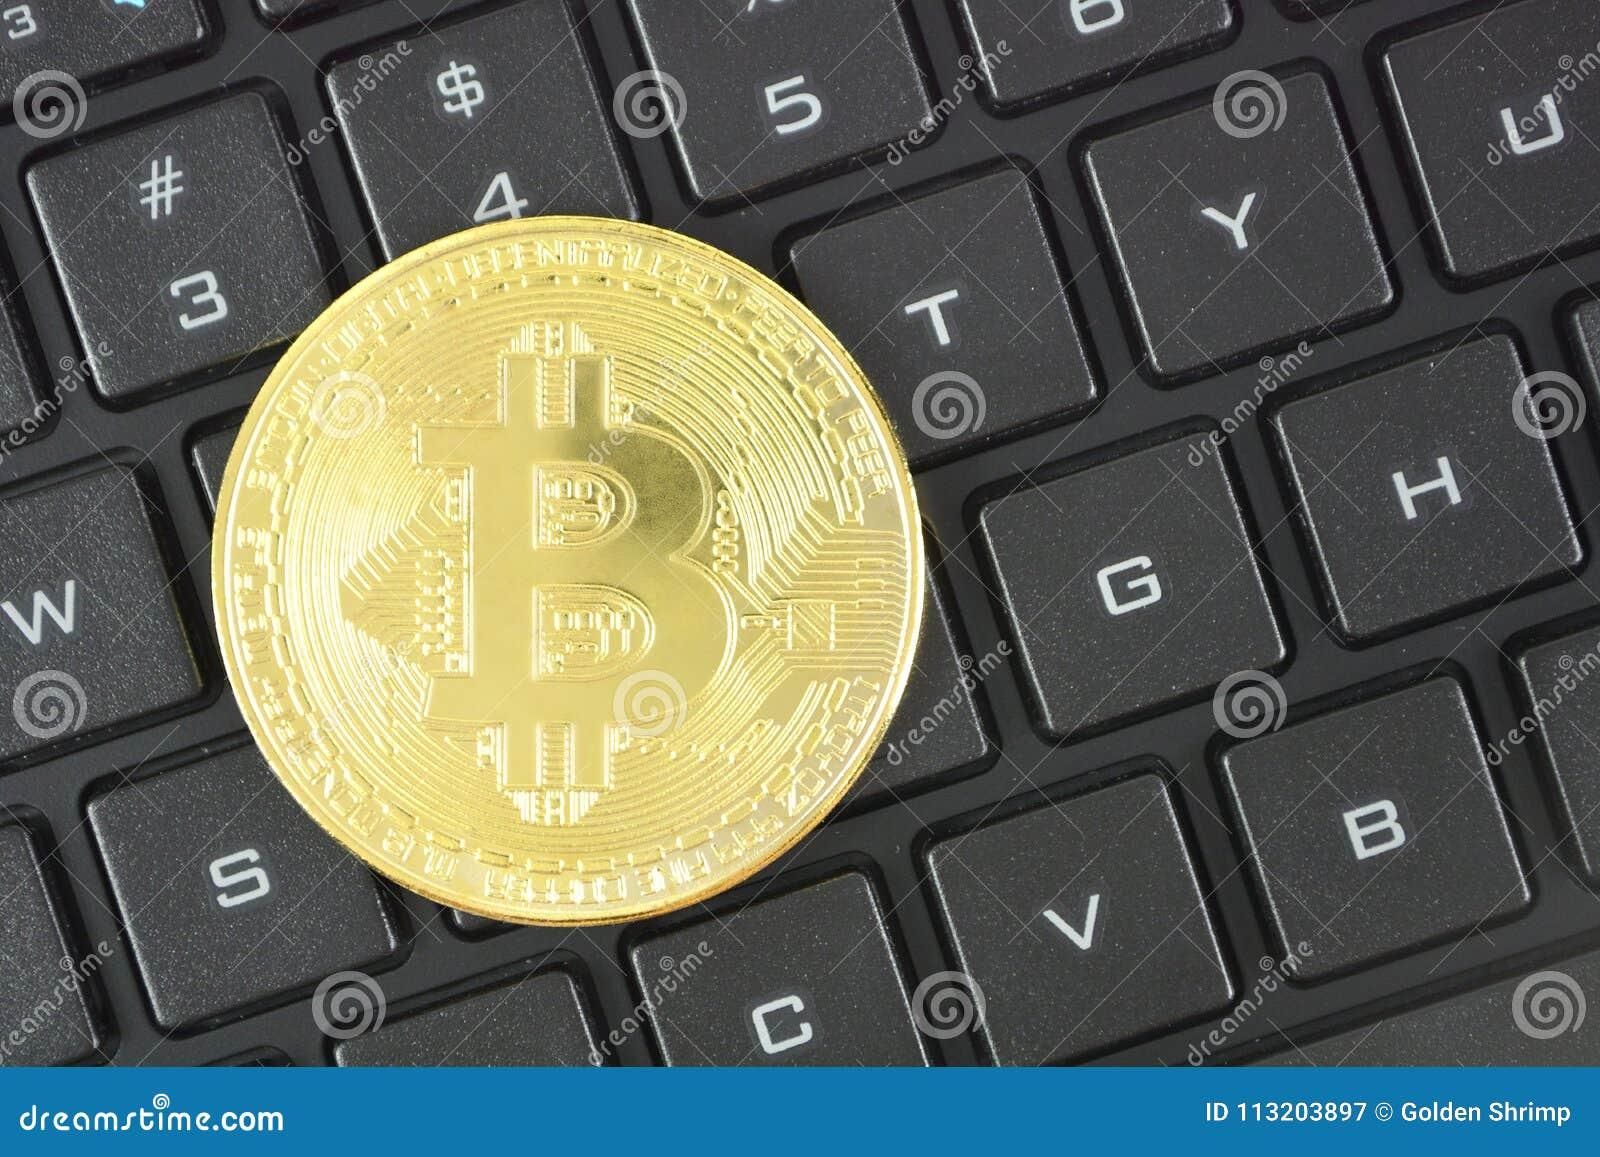 Bitcoin ATM Ottawa Mr. Bitcoinz inc. - Bitcoin Exchange